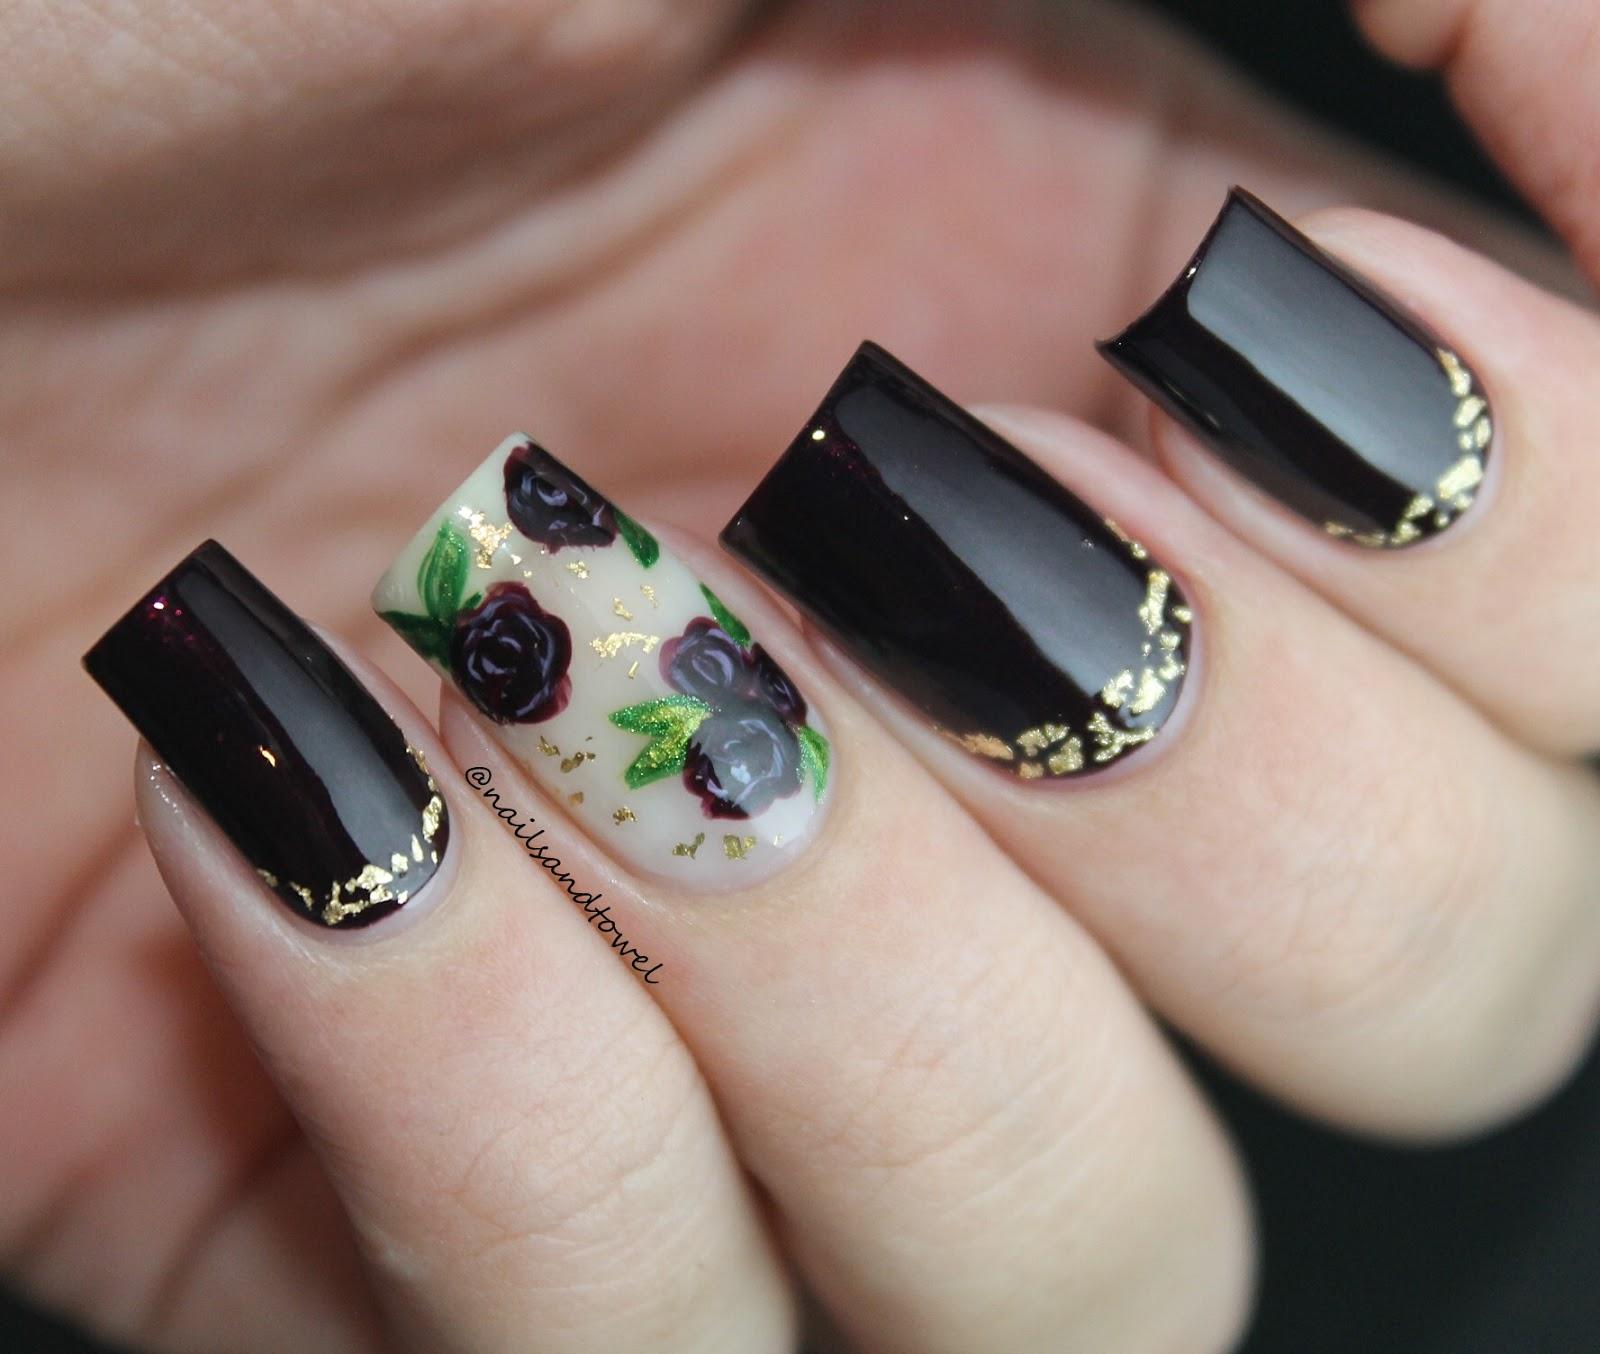 My Nail Art Journal: Elegant Vampy Roses Nails Inspired